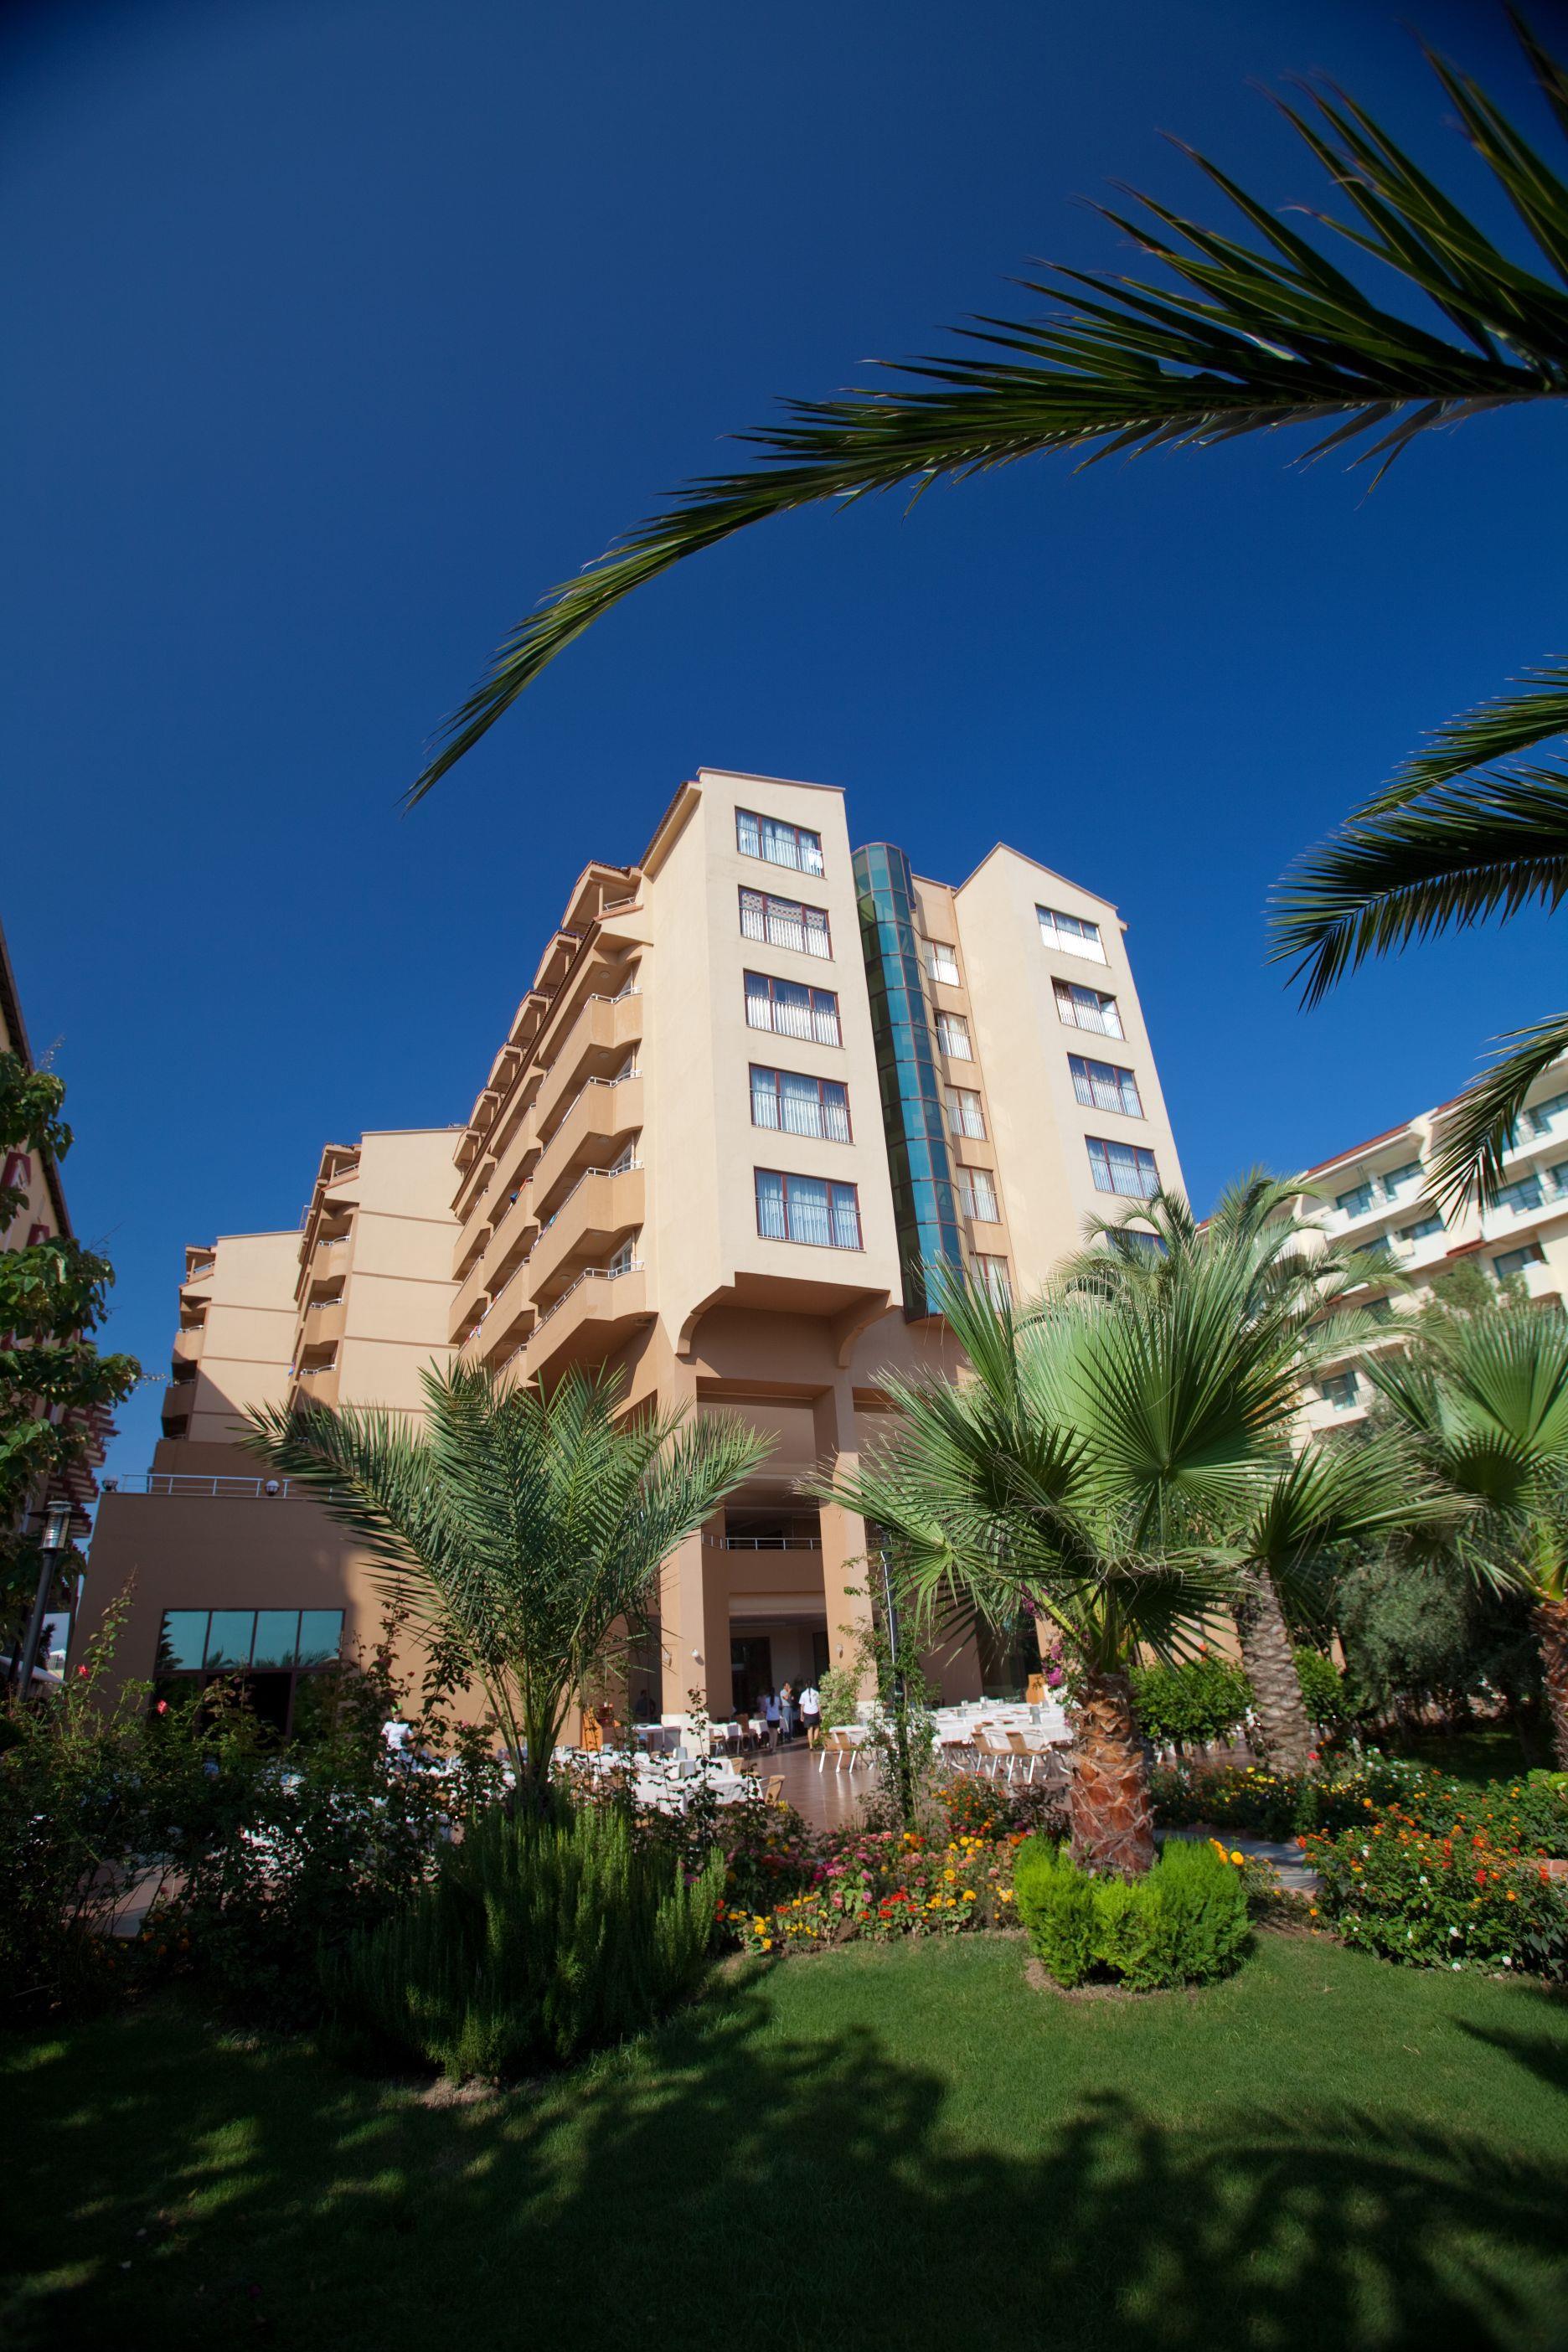 http://www.orextravel.sk/OREX/hotelphotos/stella-beach-hotel-alanya-general-009.jpg